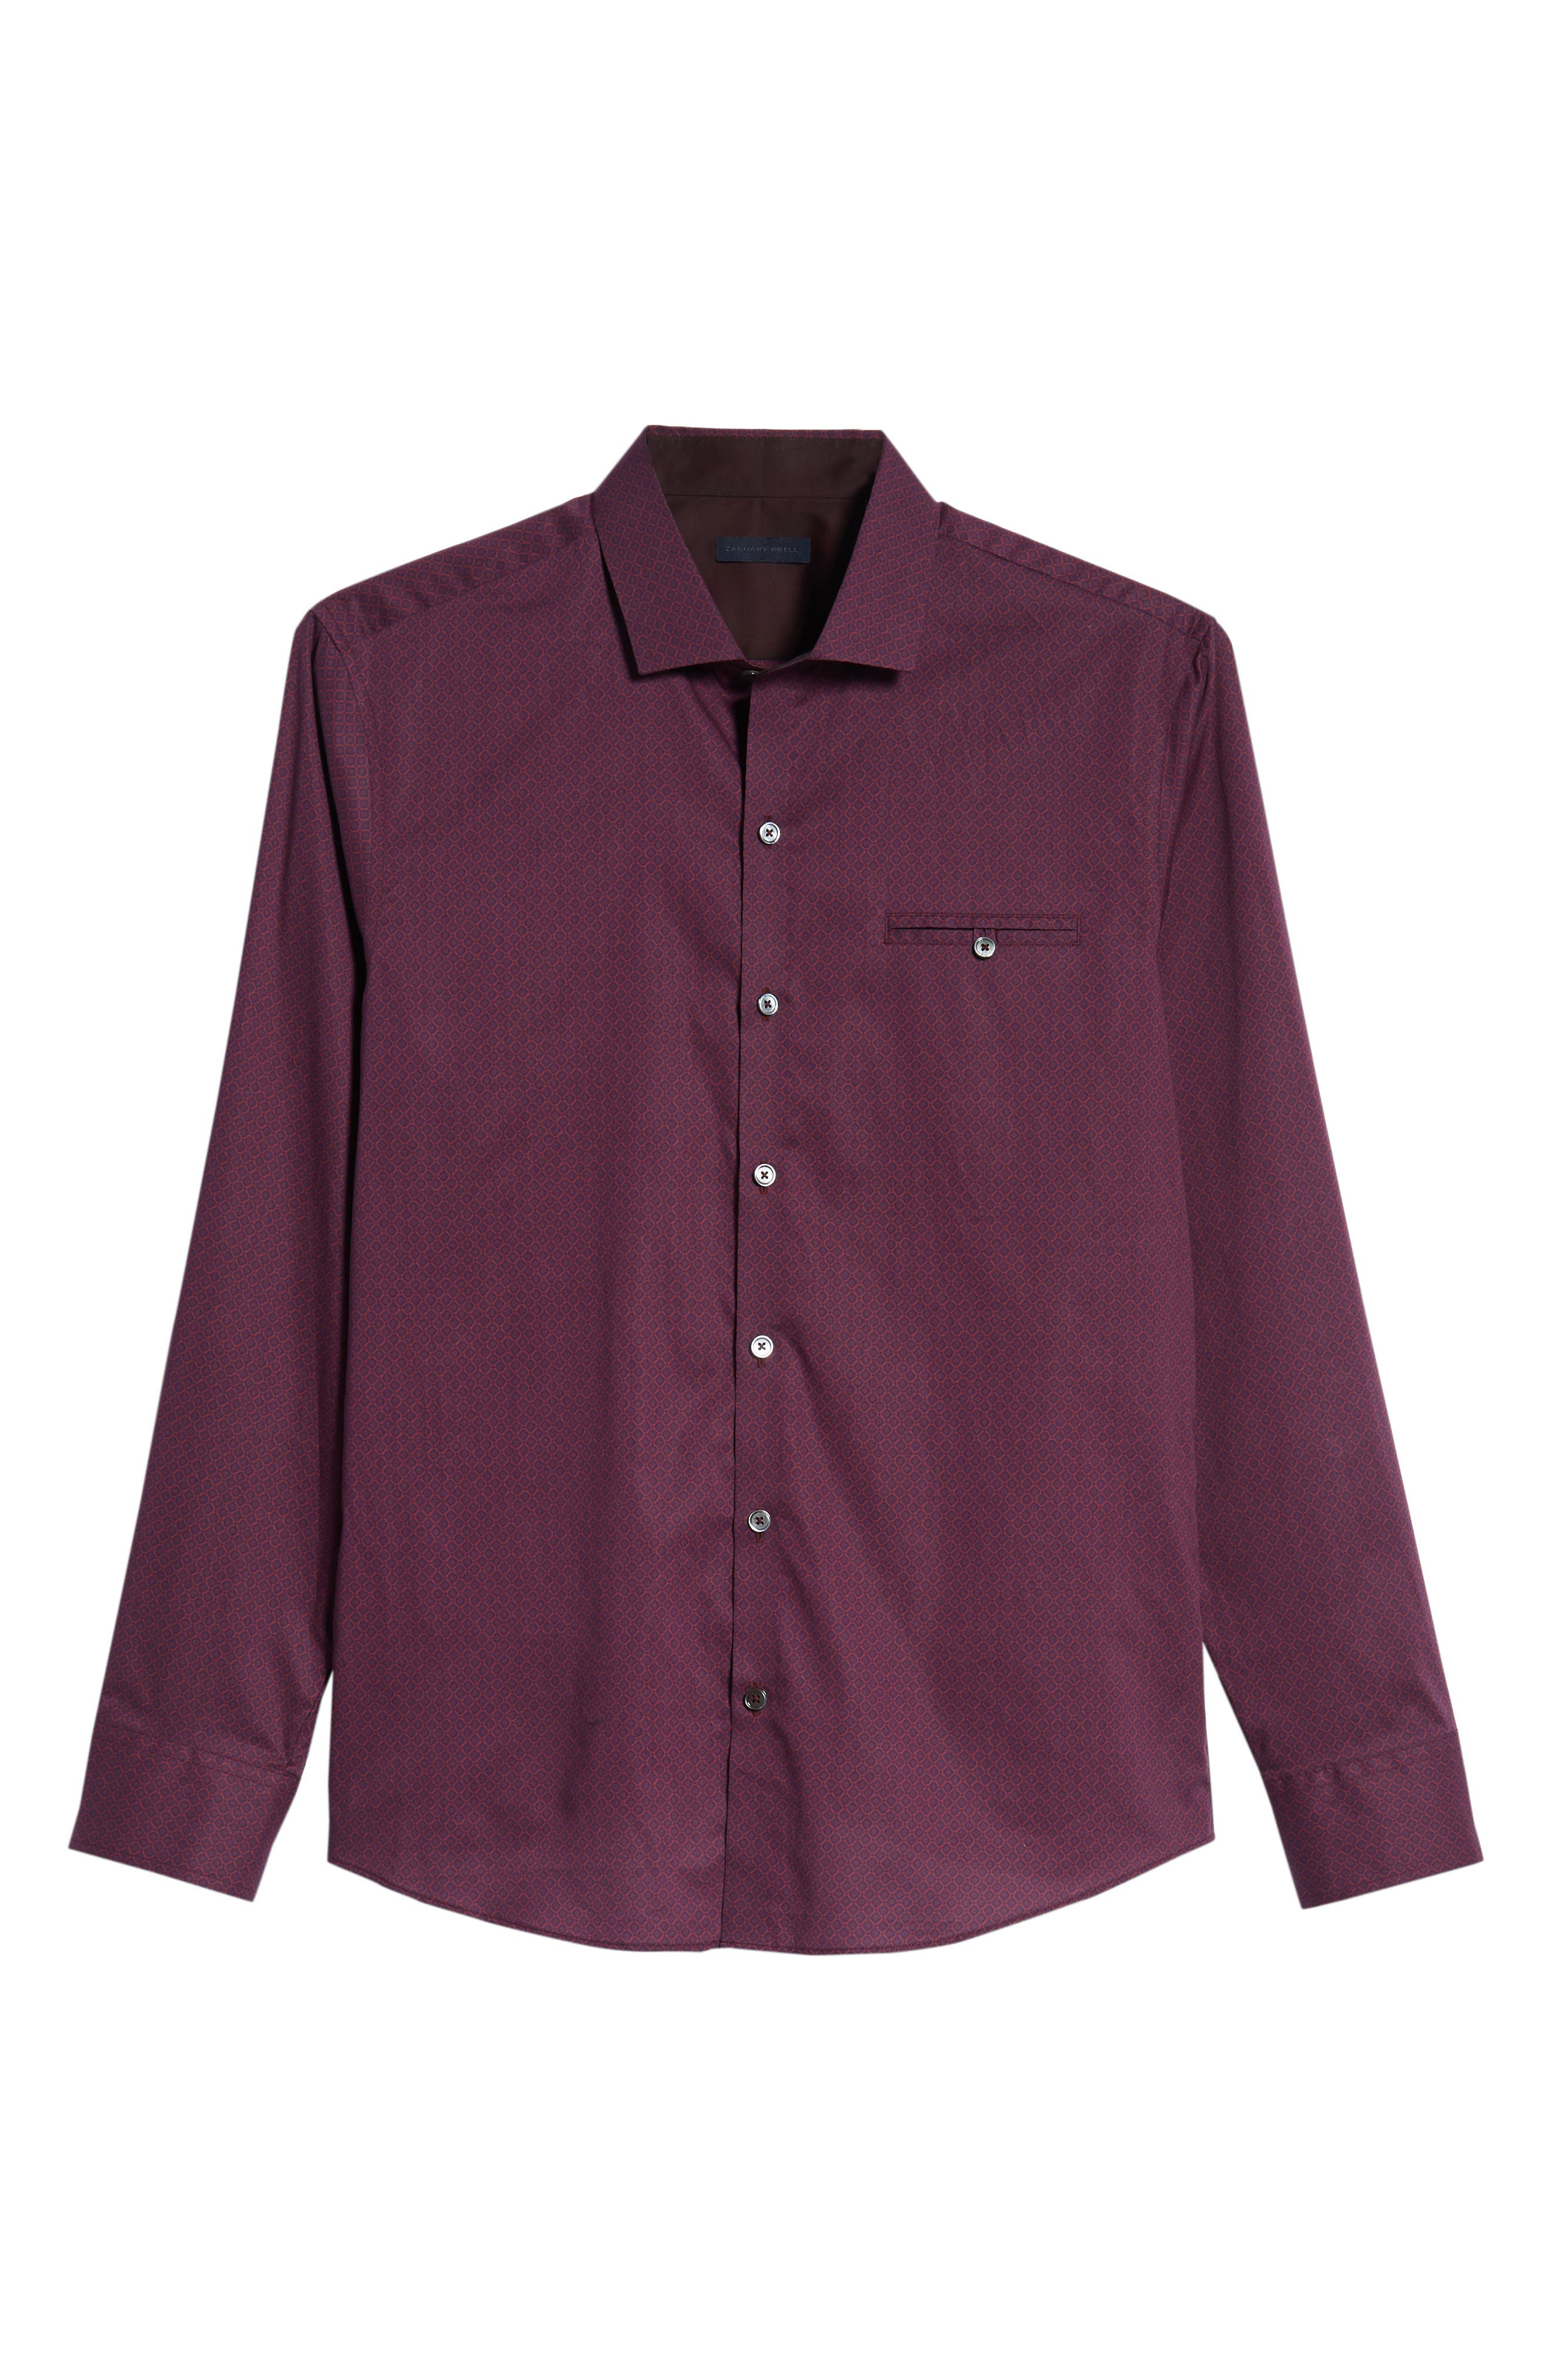 Shamus Regular Fit Sport Shirt,                             Alternate thumbnail 5, color,                             MAROON